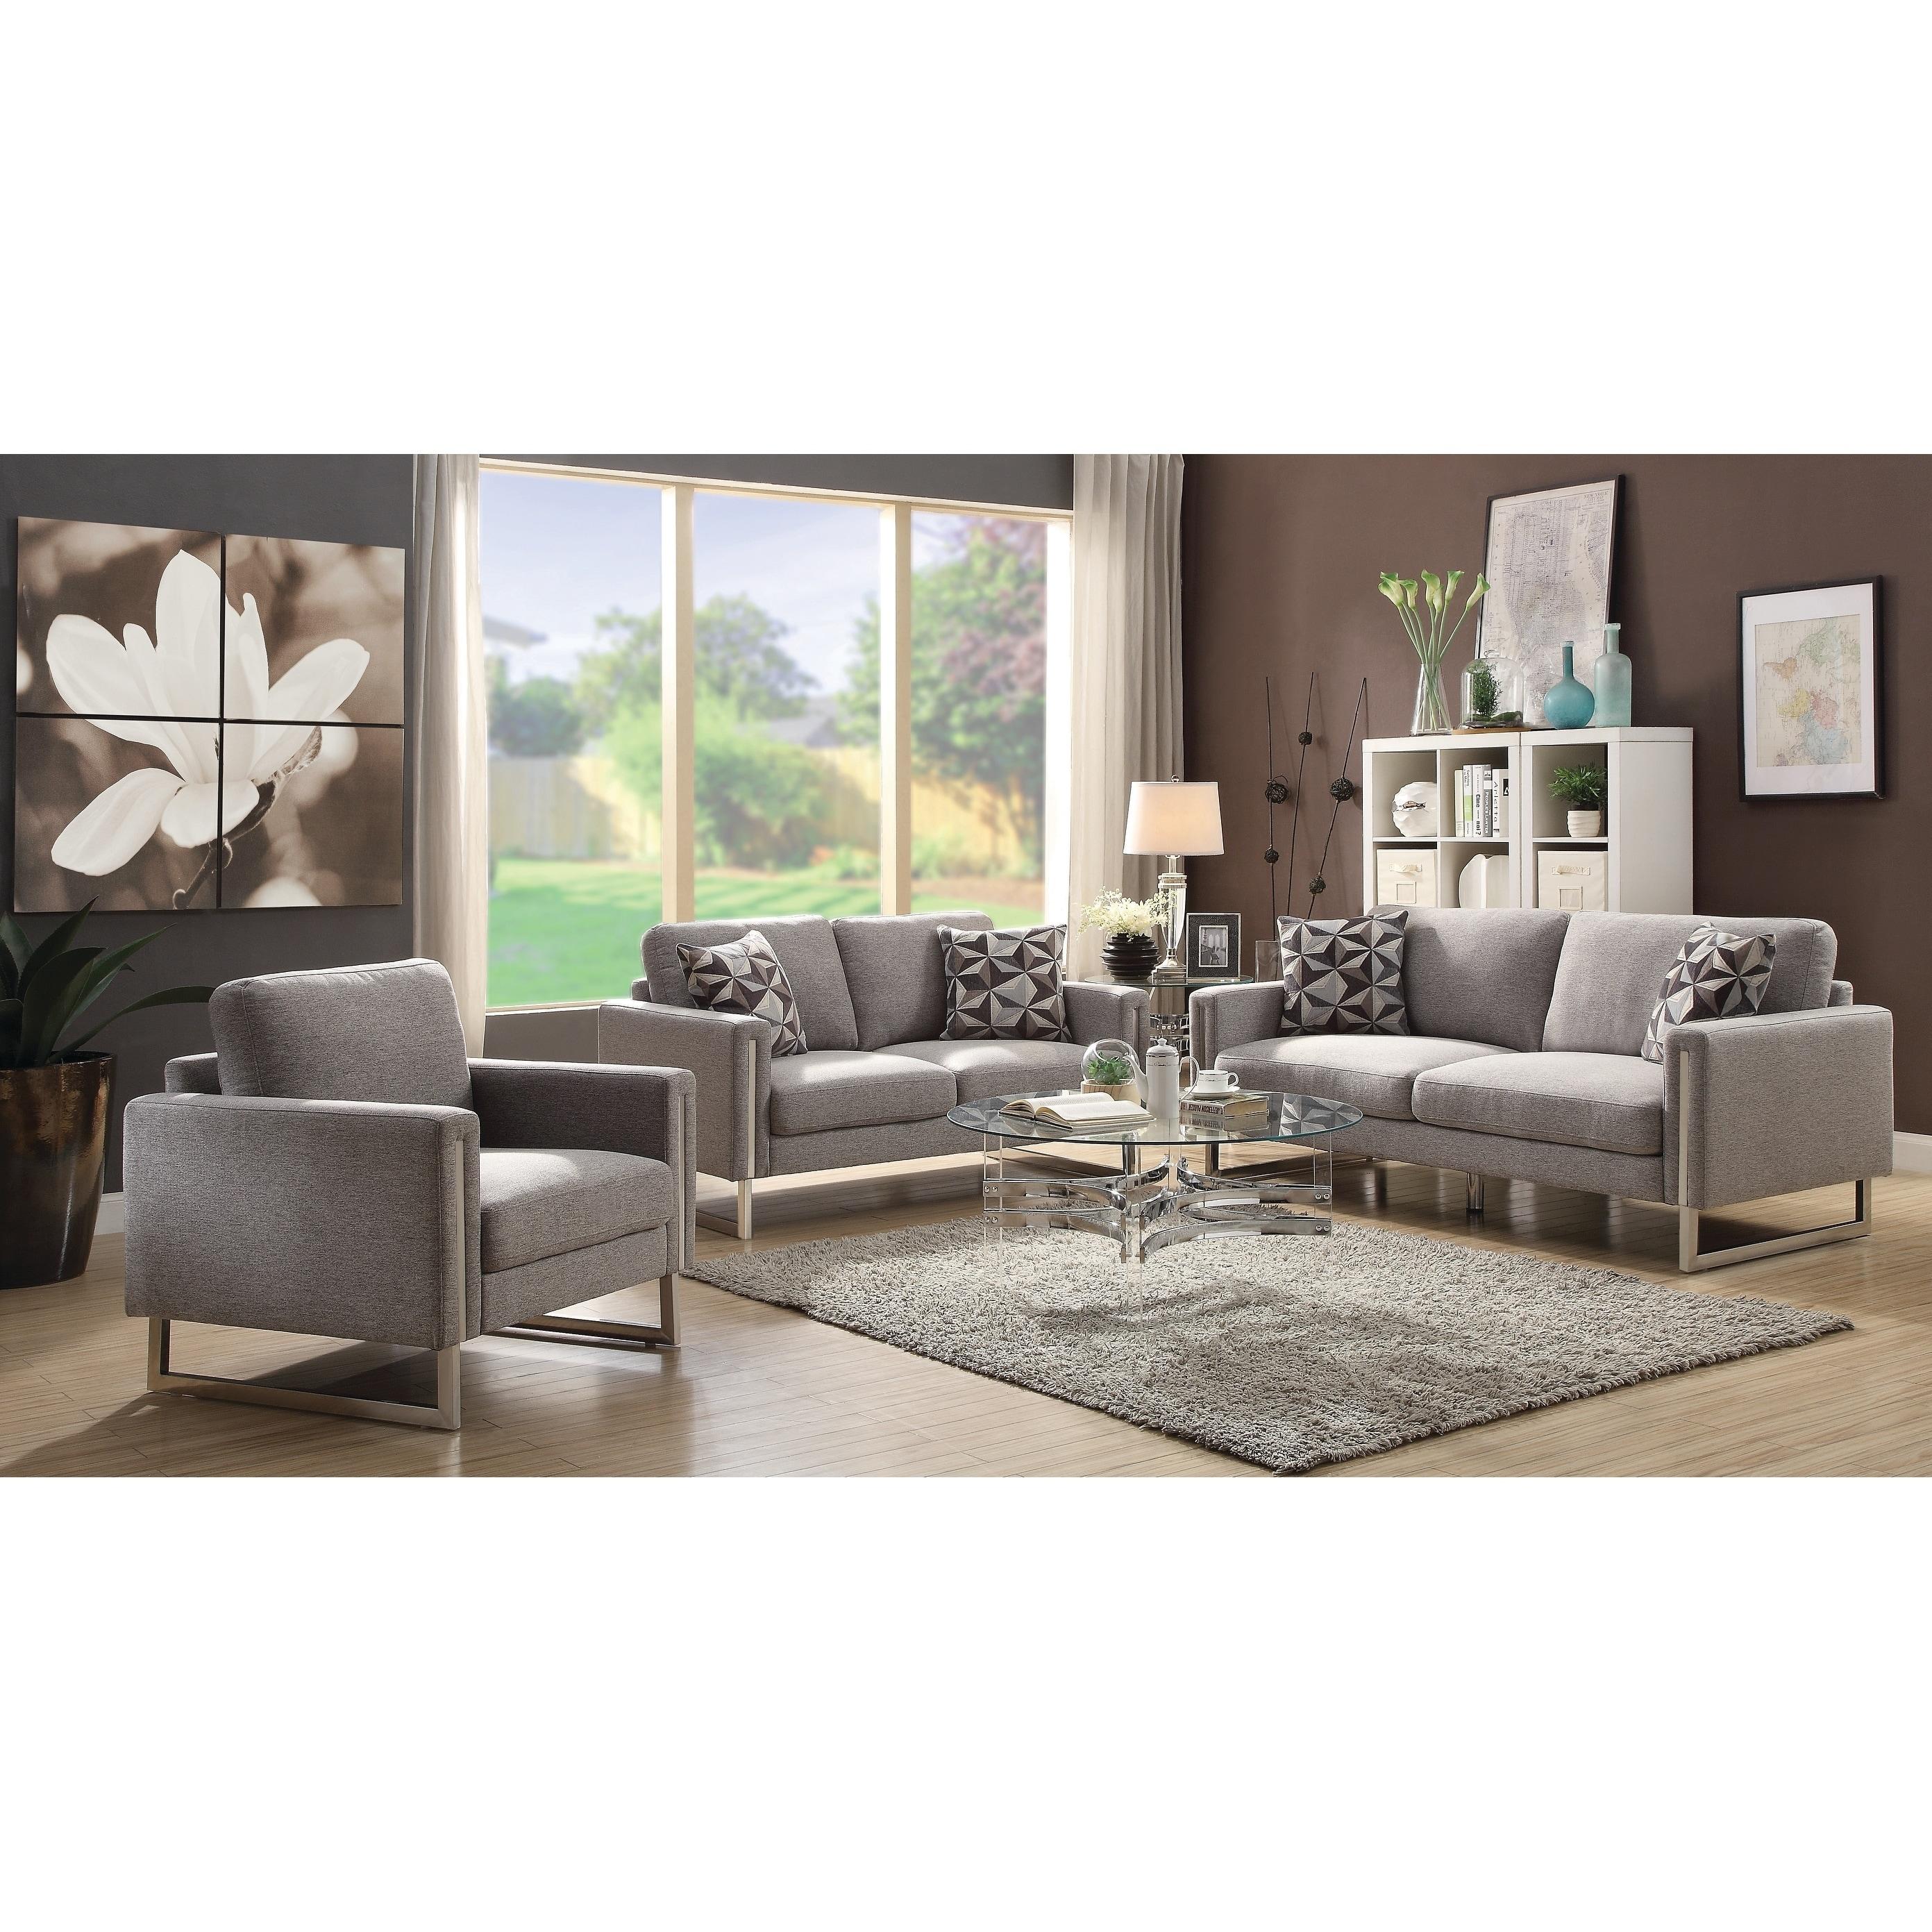 Stellan Contemporary Grey 3-piece Living Room Set - N/A